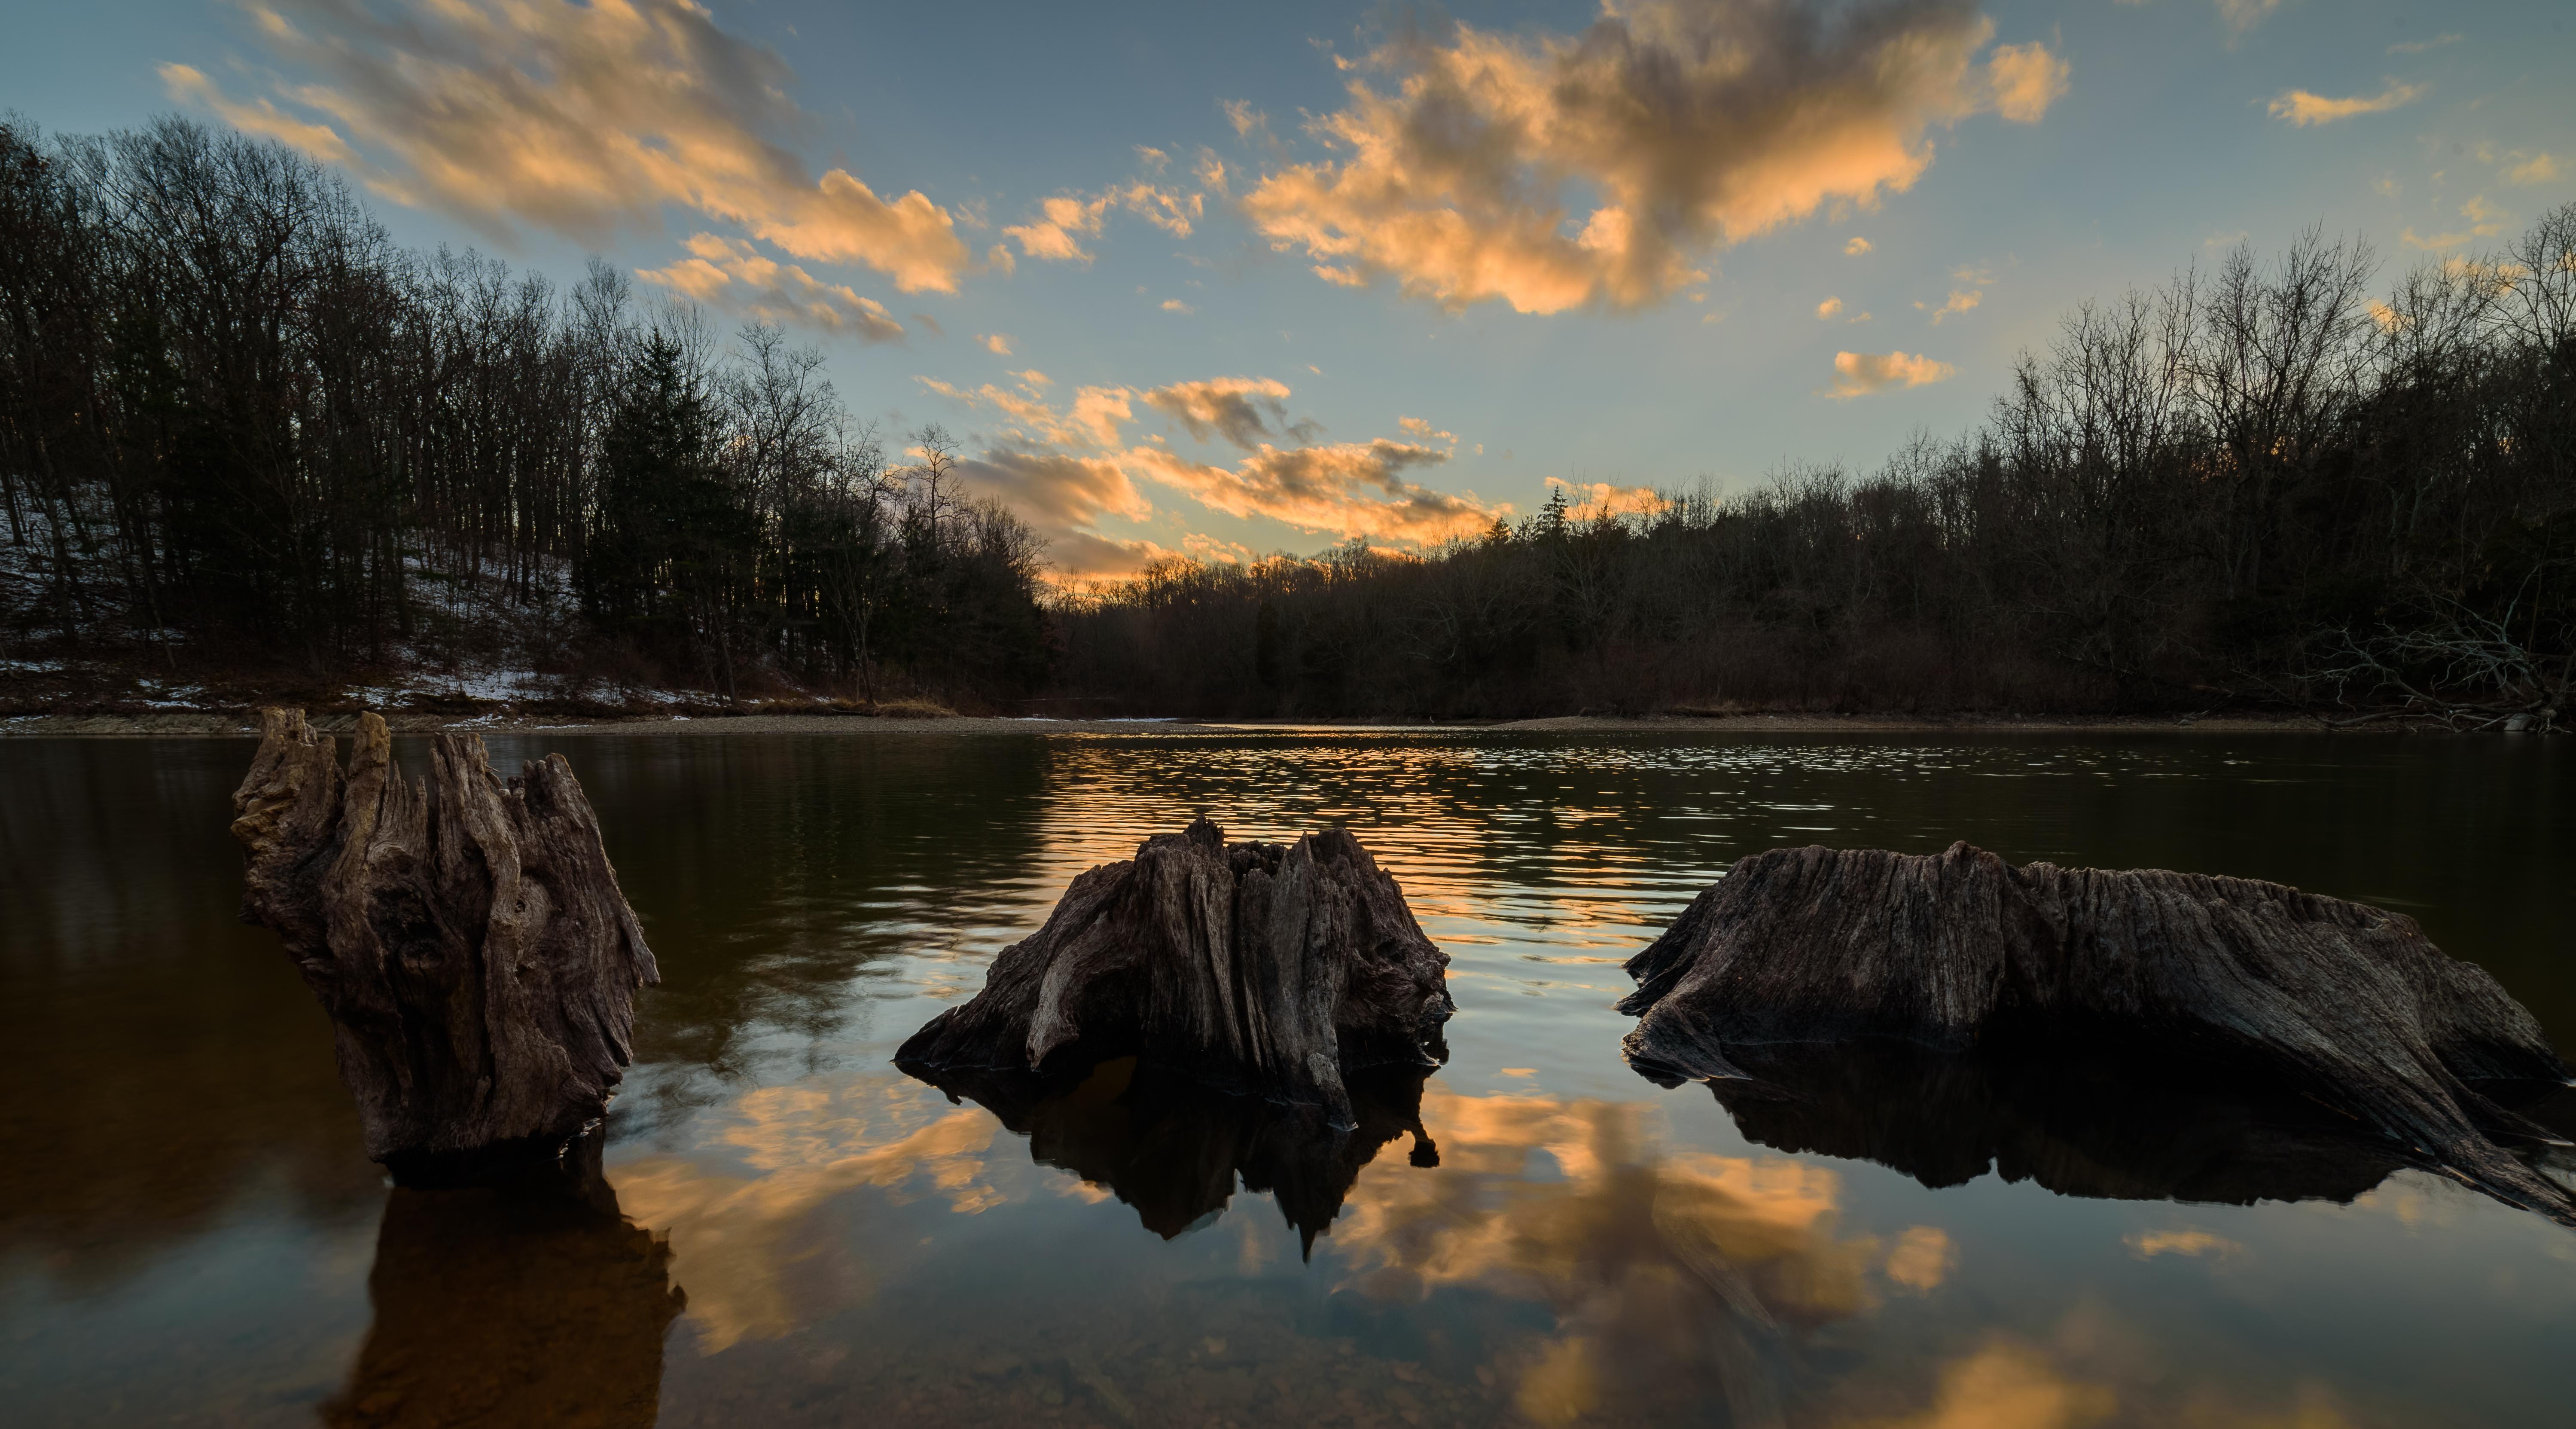 Wallpaper Coucherdesoleil Nature Paysage Sunset